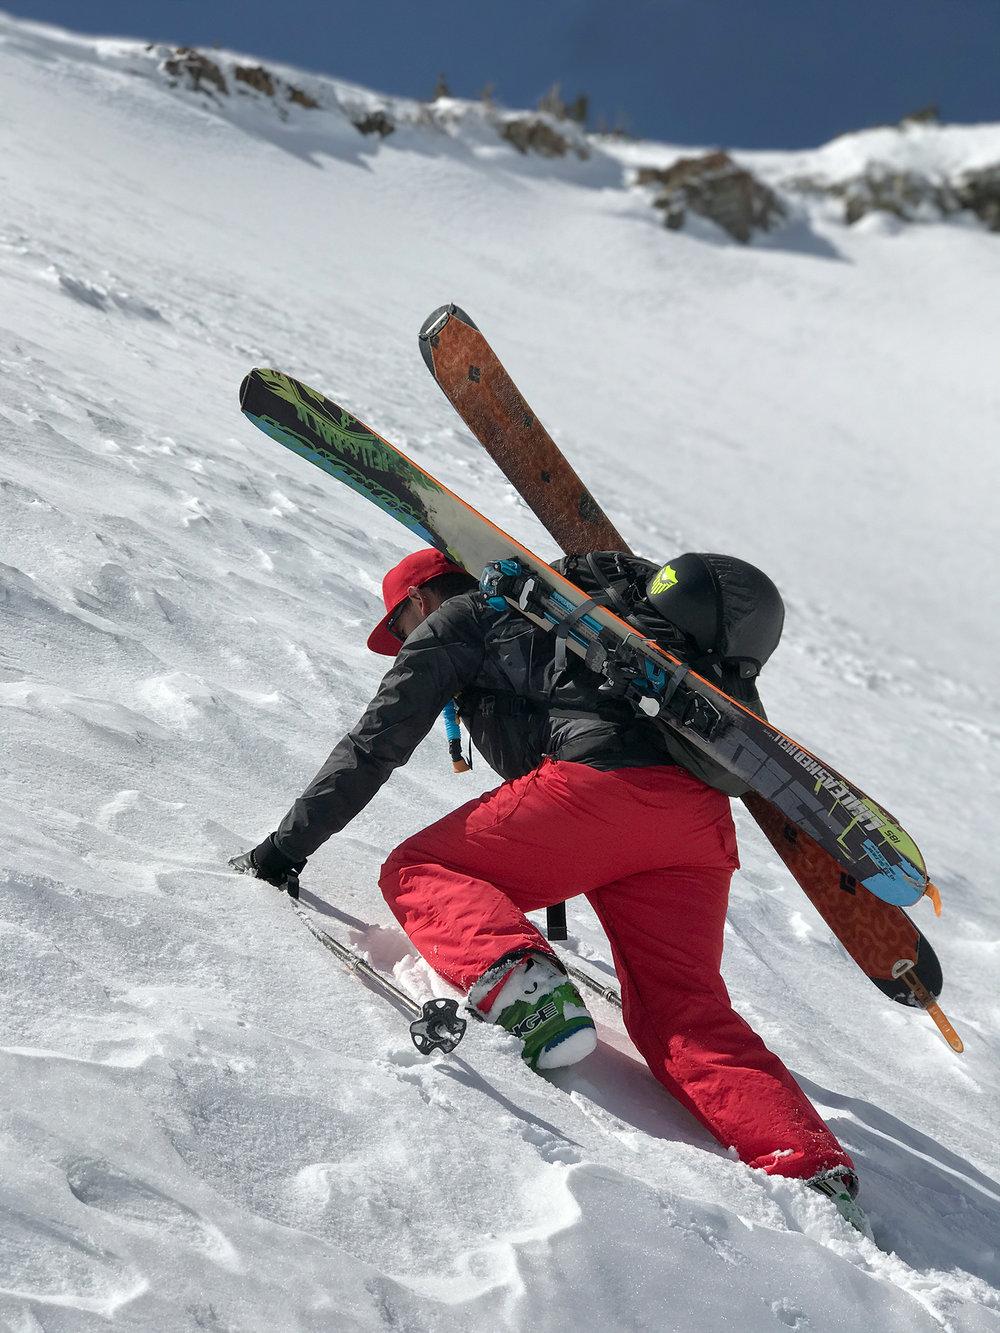 burke-alder-ski-boot-picture-mt-timpanogos.jpg